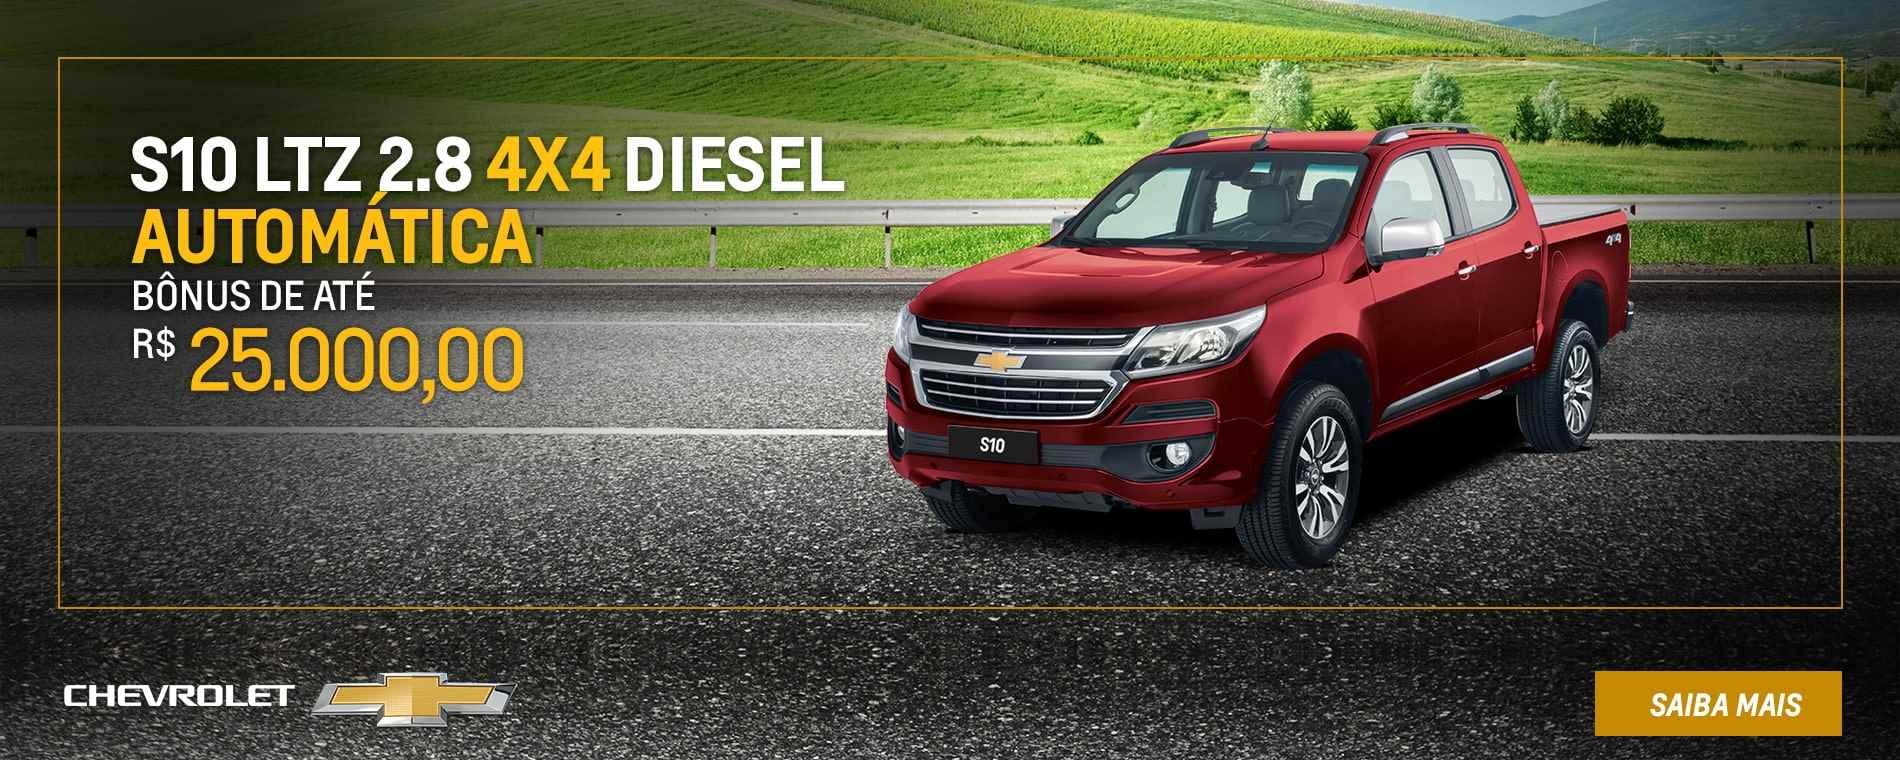 169_Uvel_S10-2.8-4X4-Diesel-Automatica_DestaqueDesk-min